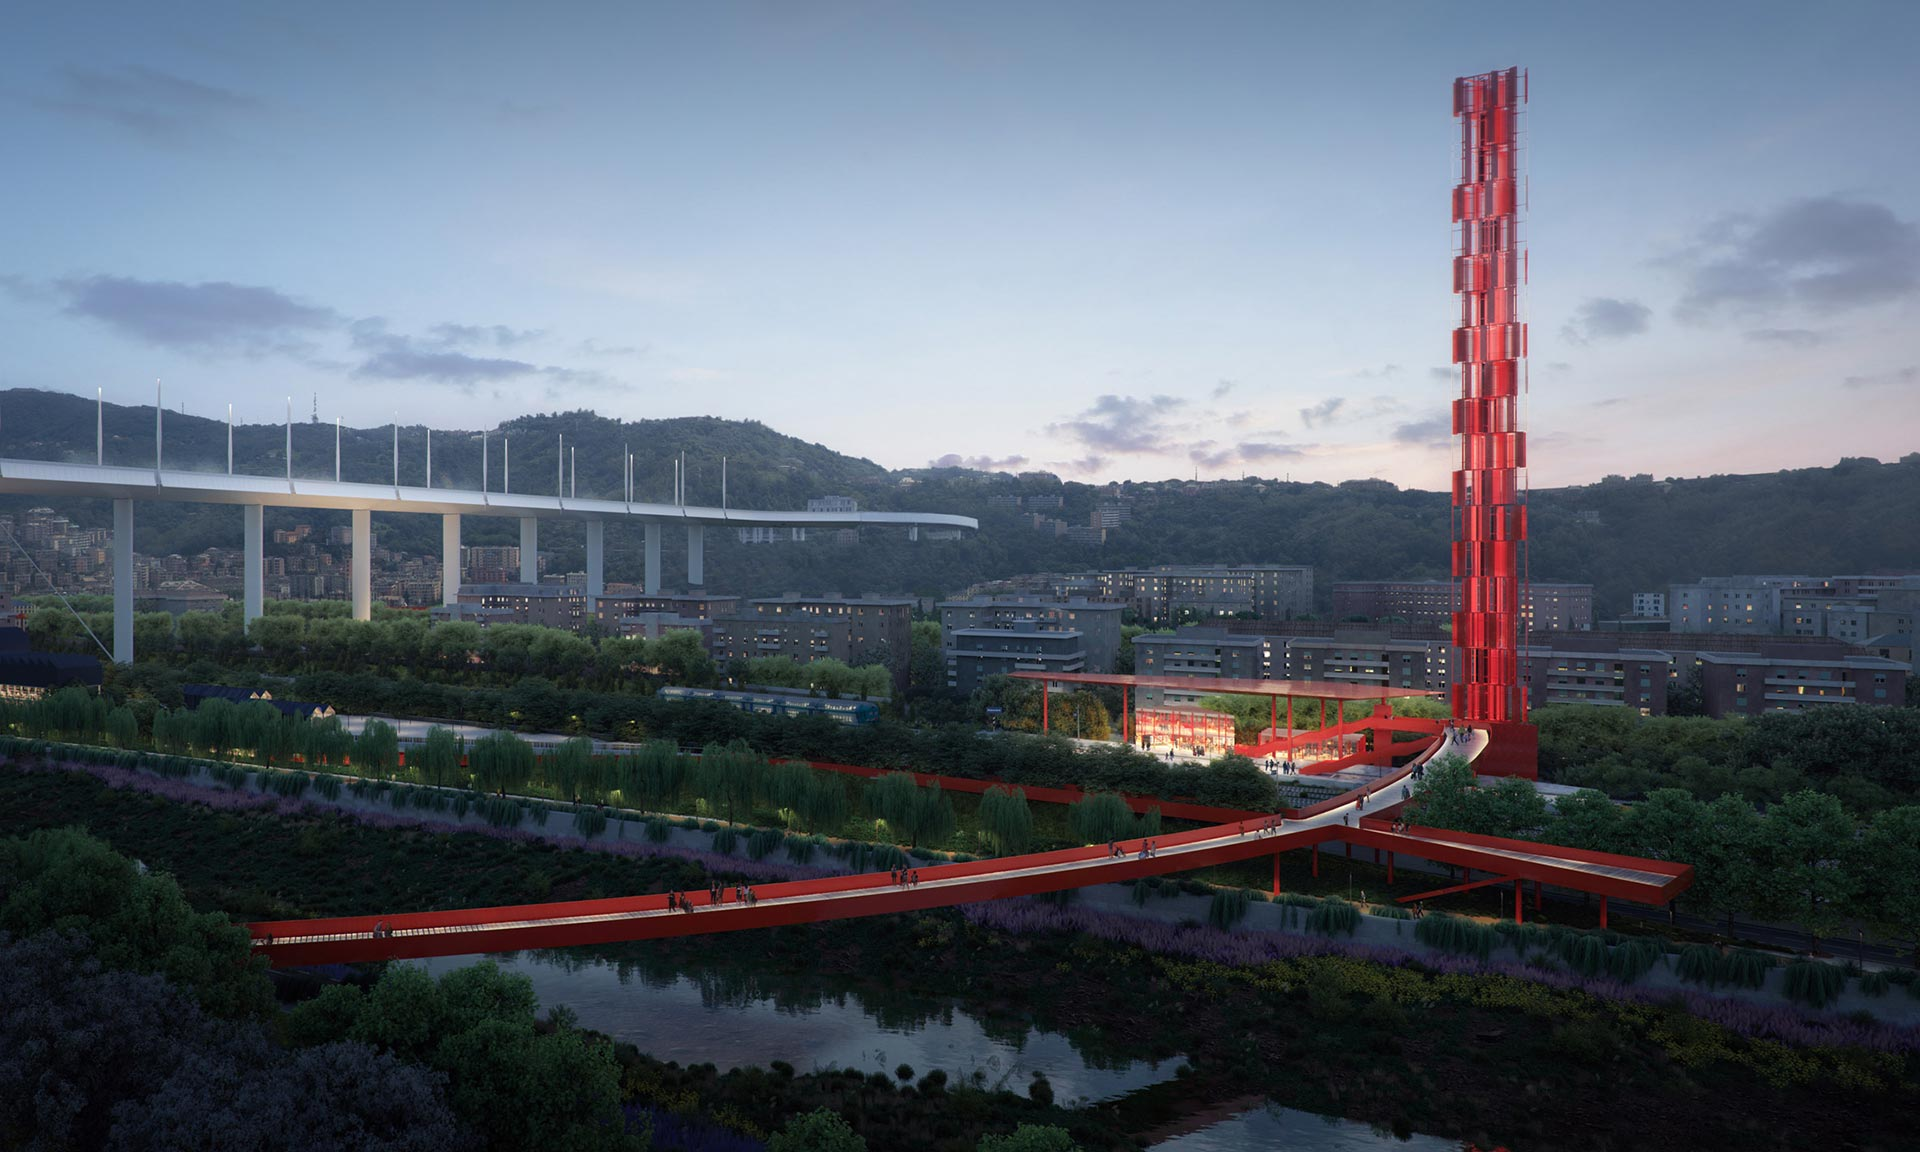 Stefano Boeri navrhl kruhovou promenádu apark pod mostem Ponte Genova